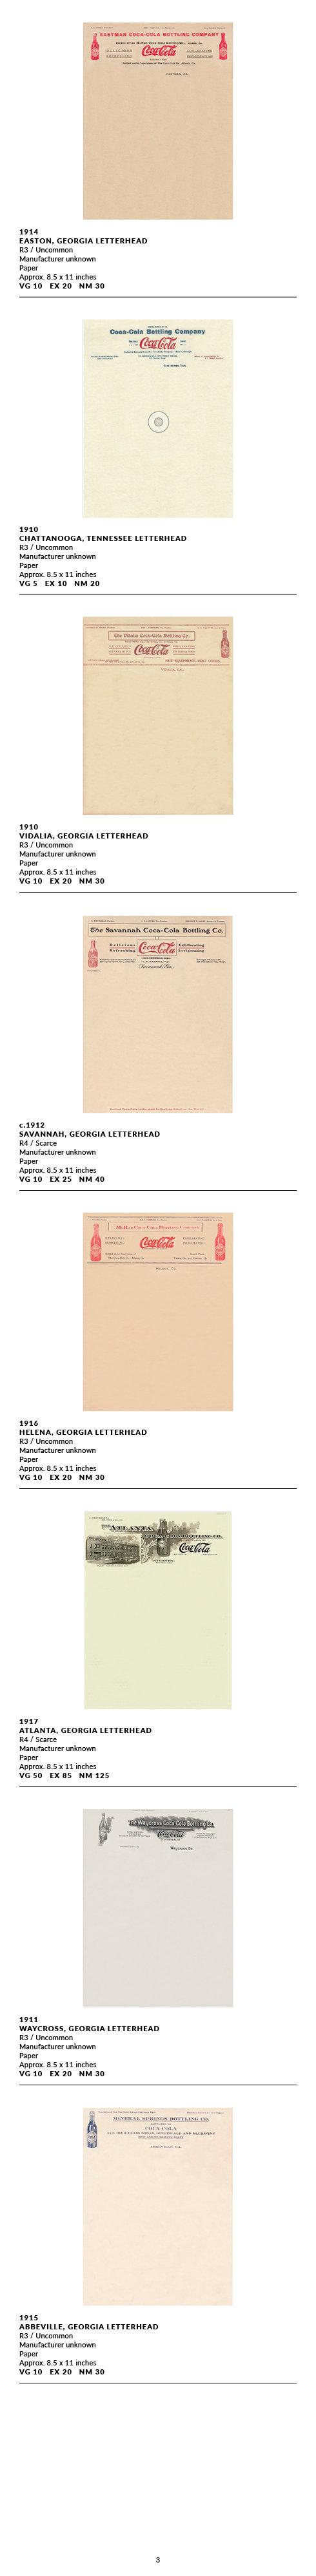 Letterhead3.jpg